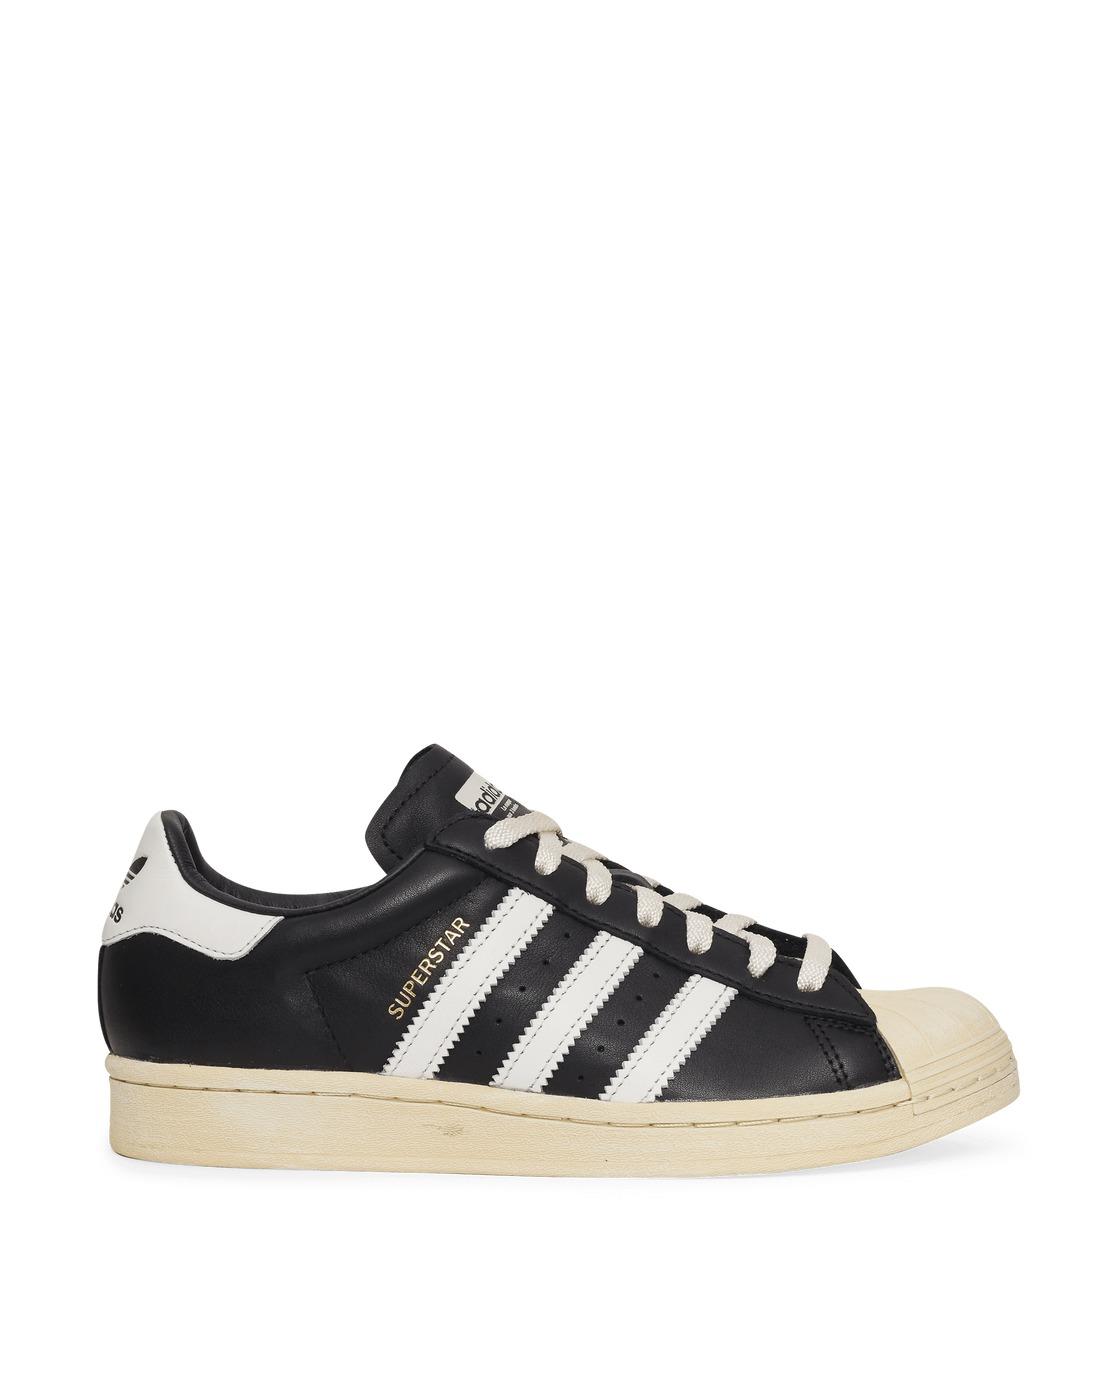 Adidas Originals Superstar Sneakers Core Black/White